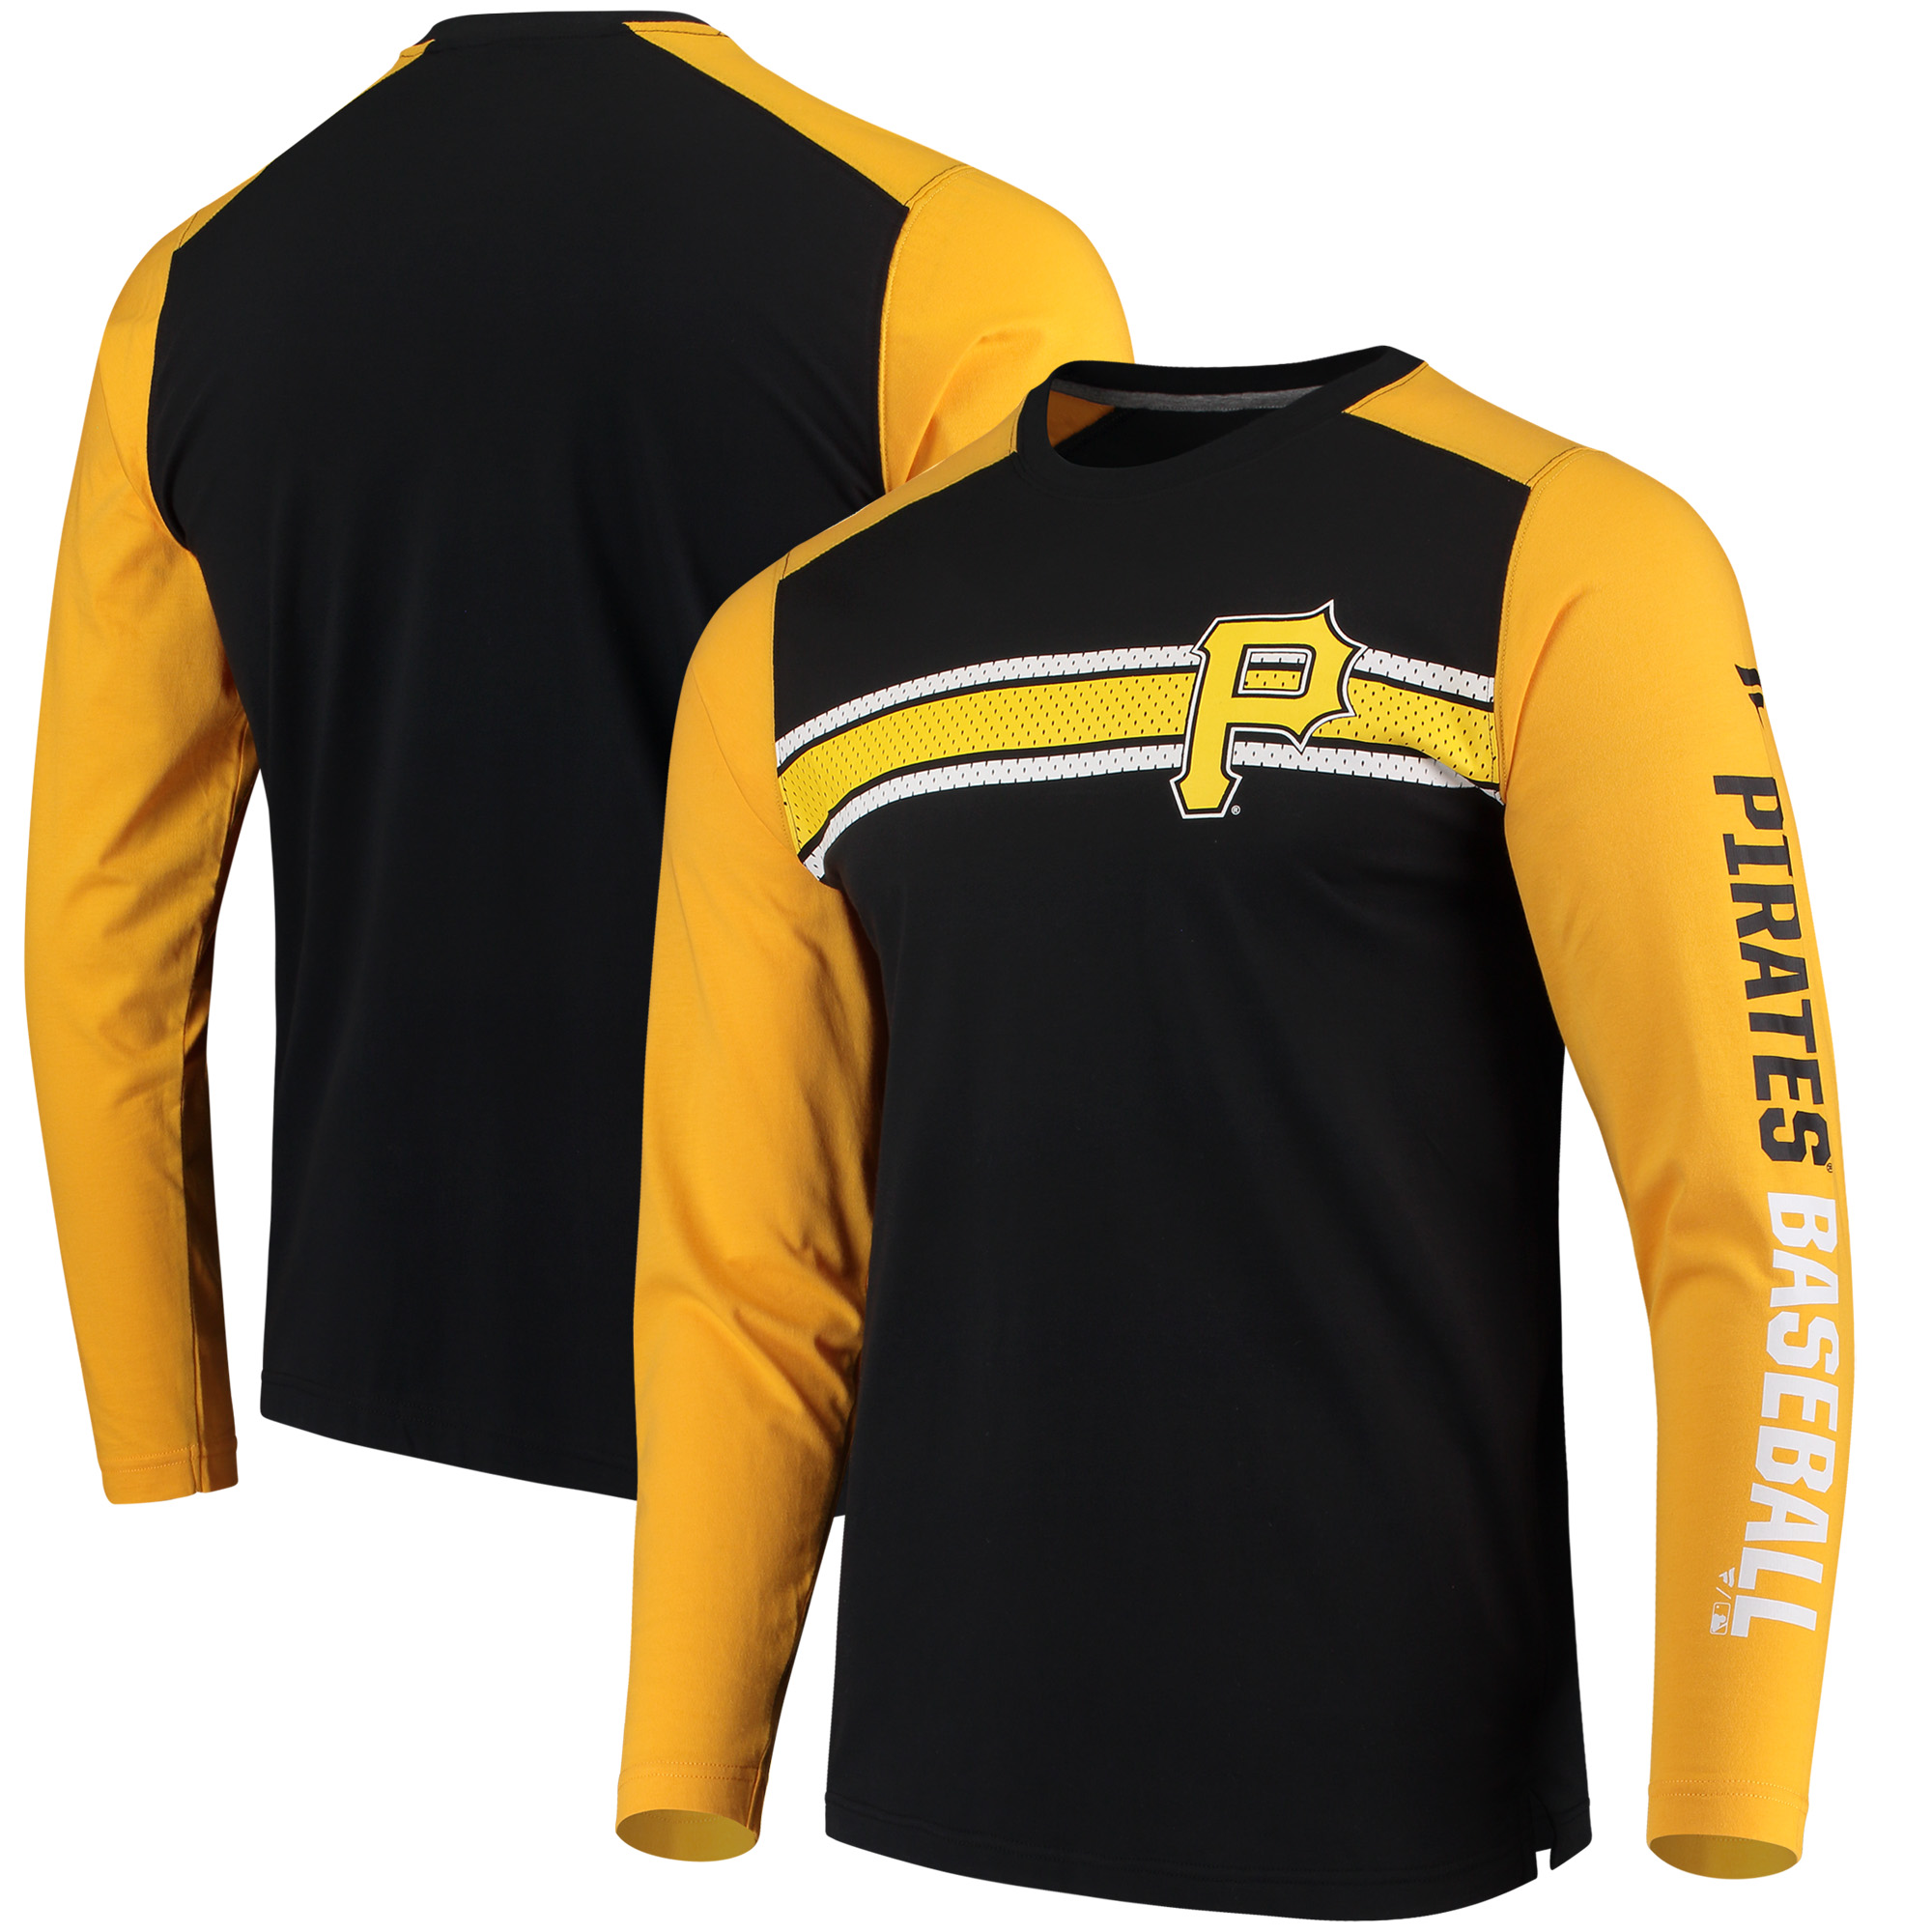 Pittsburgh Pirates Fanatics Branded Iconic Long Sleeve T-Shirt - Black